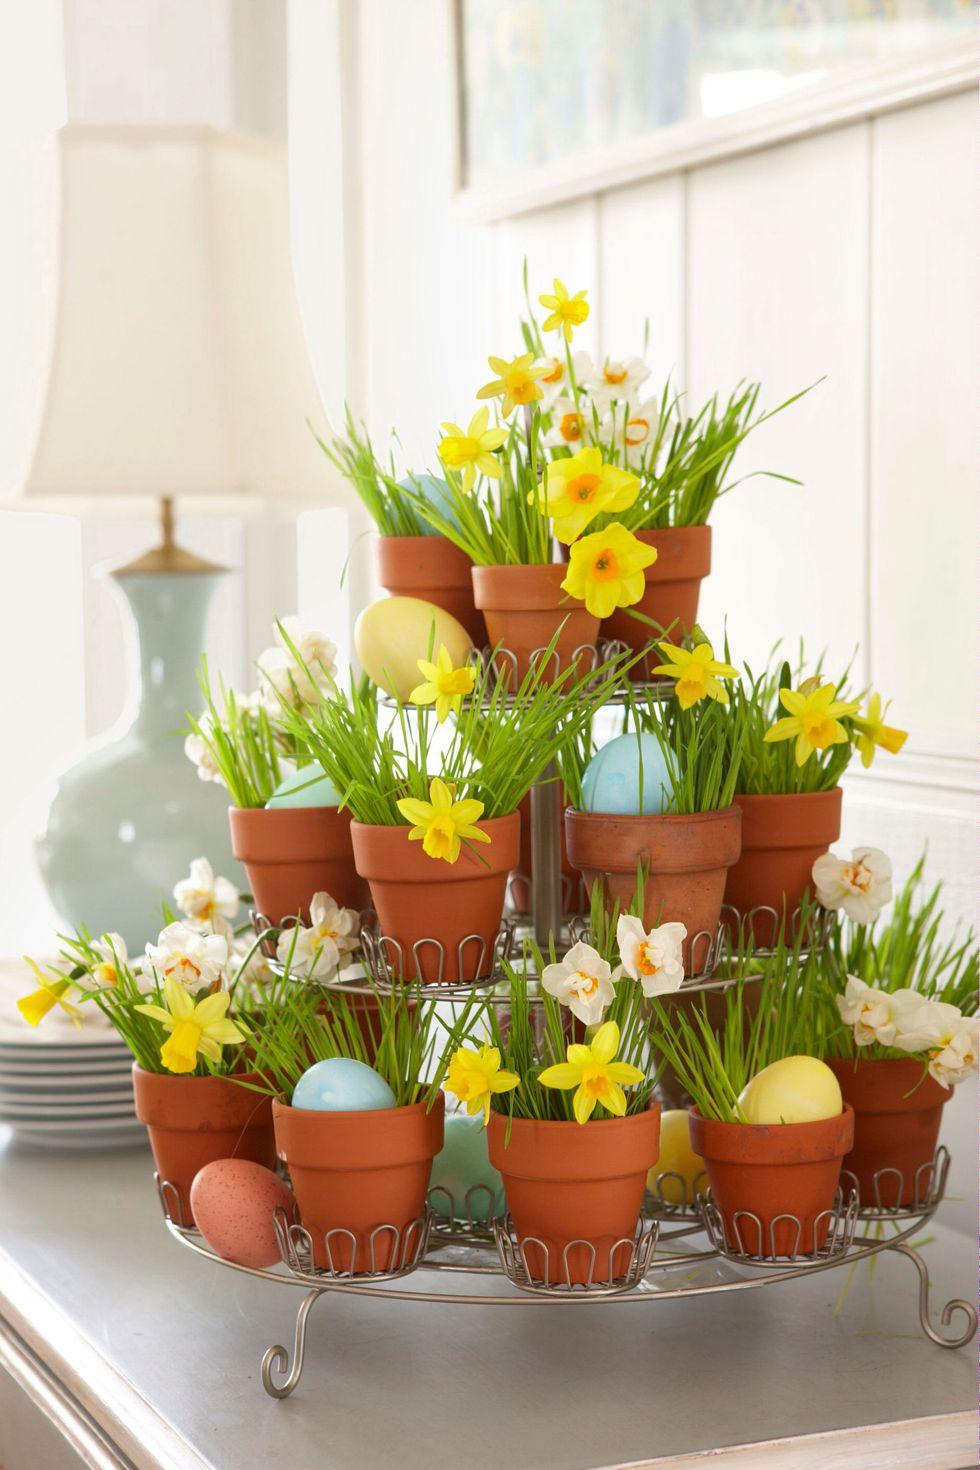 5500418ee99aa-daffodil-decoration-cupcake-tray-0410-zphg1k-s2